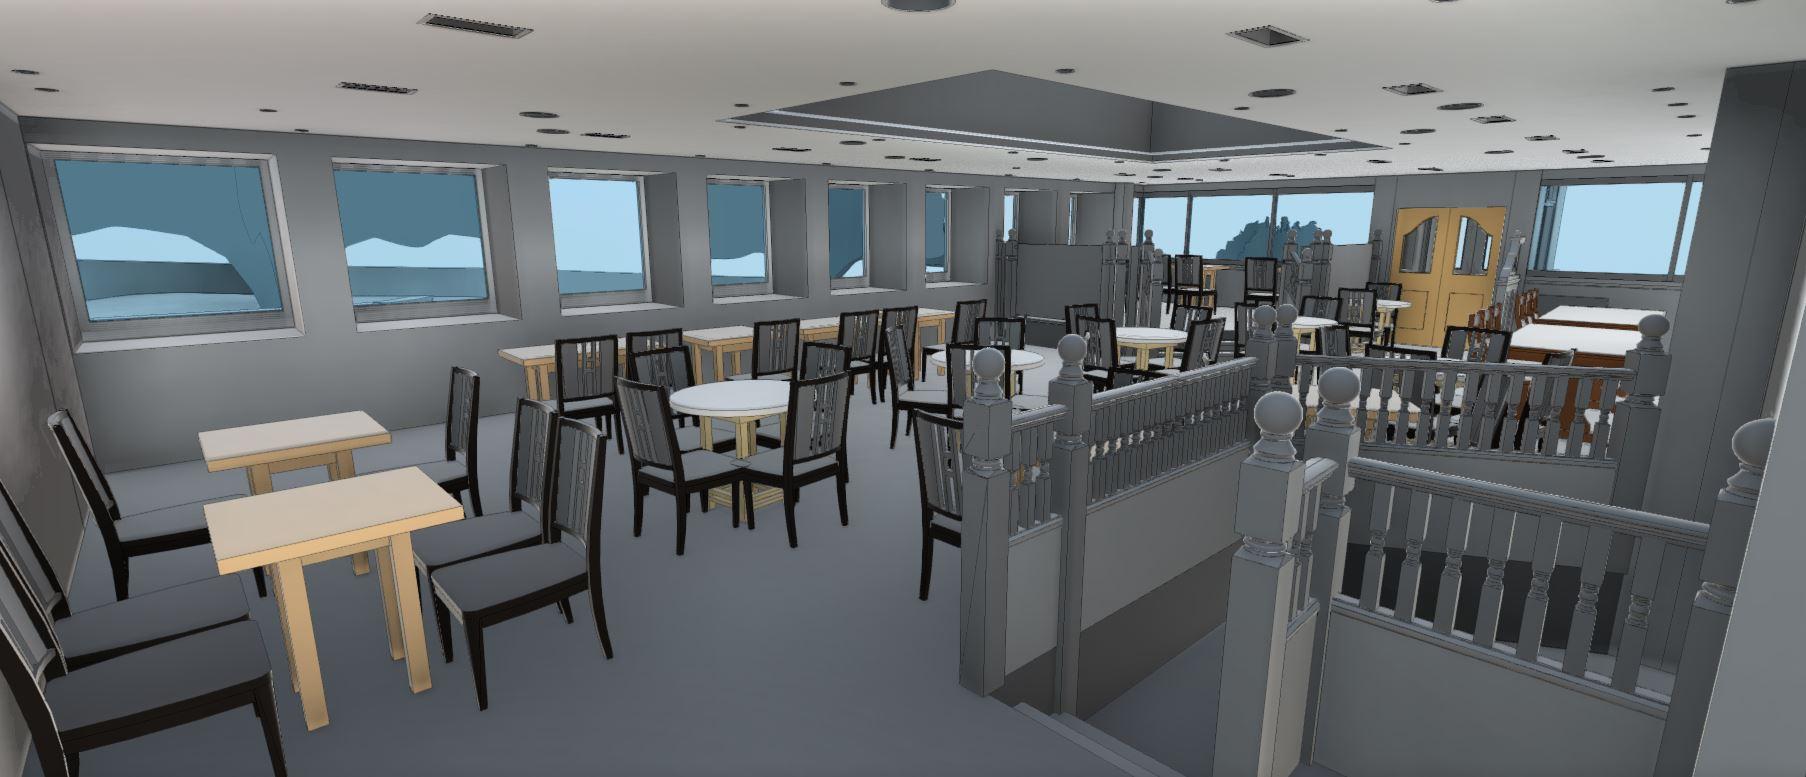 3D 2D Floor Plan Survey